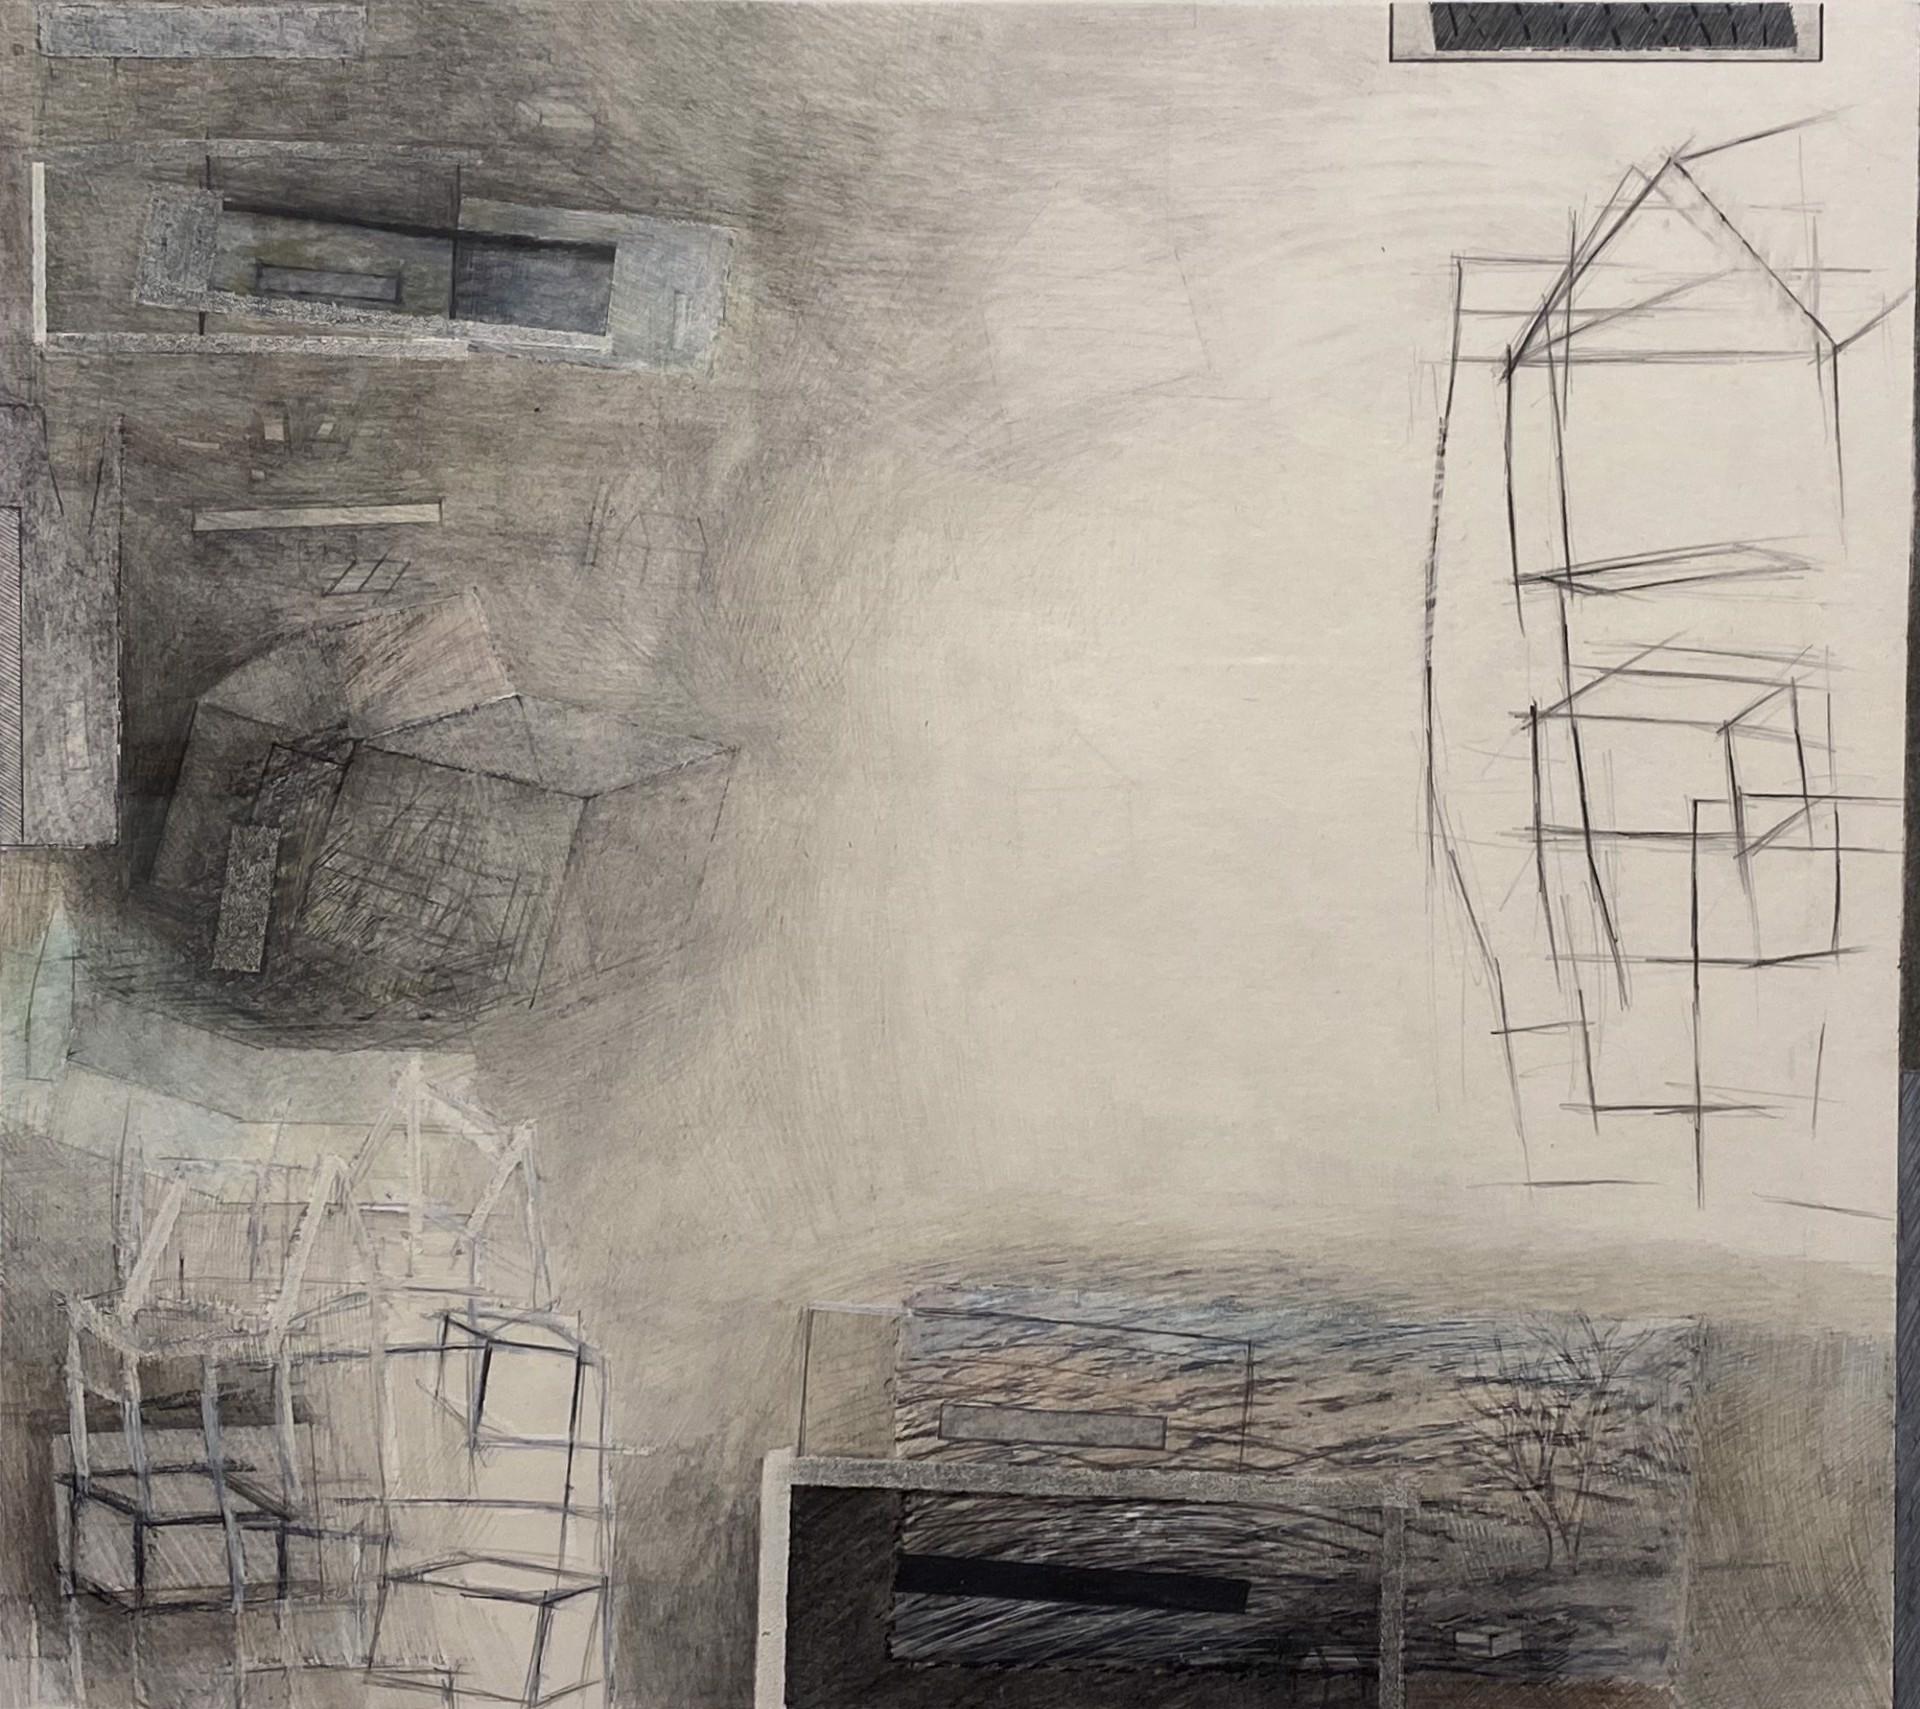 Building a Dream by Randall Reid